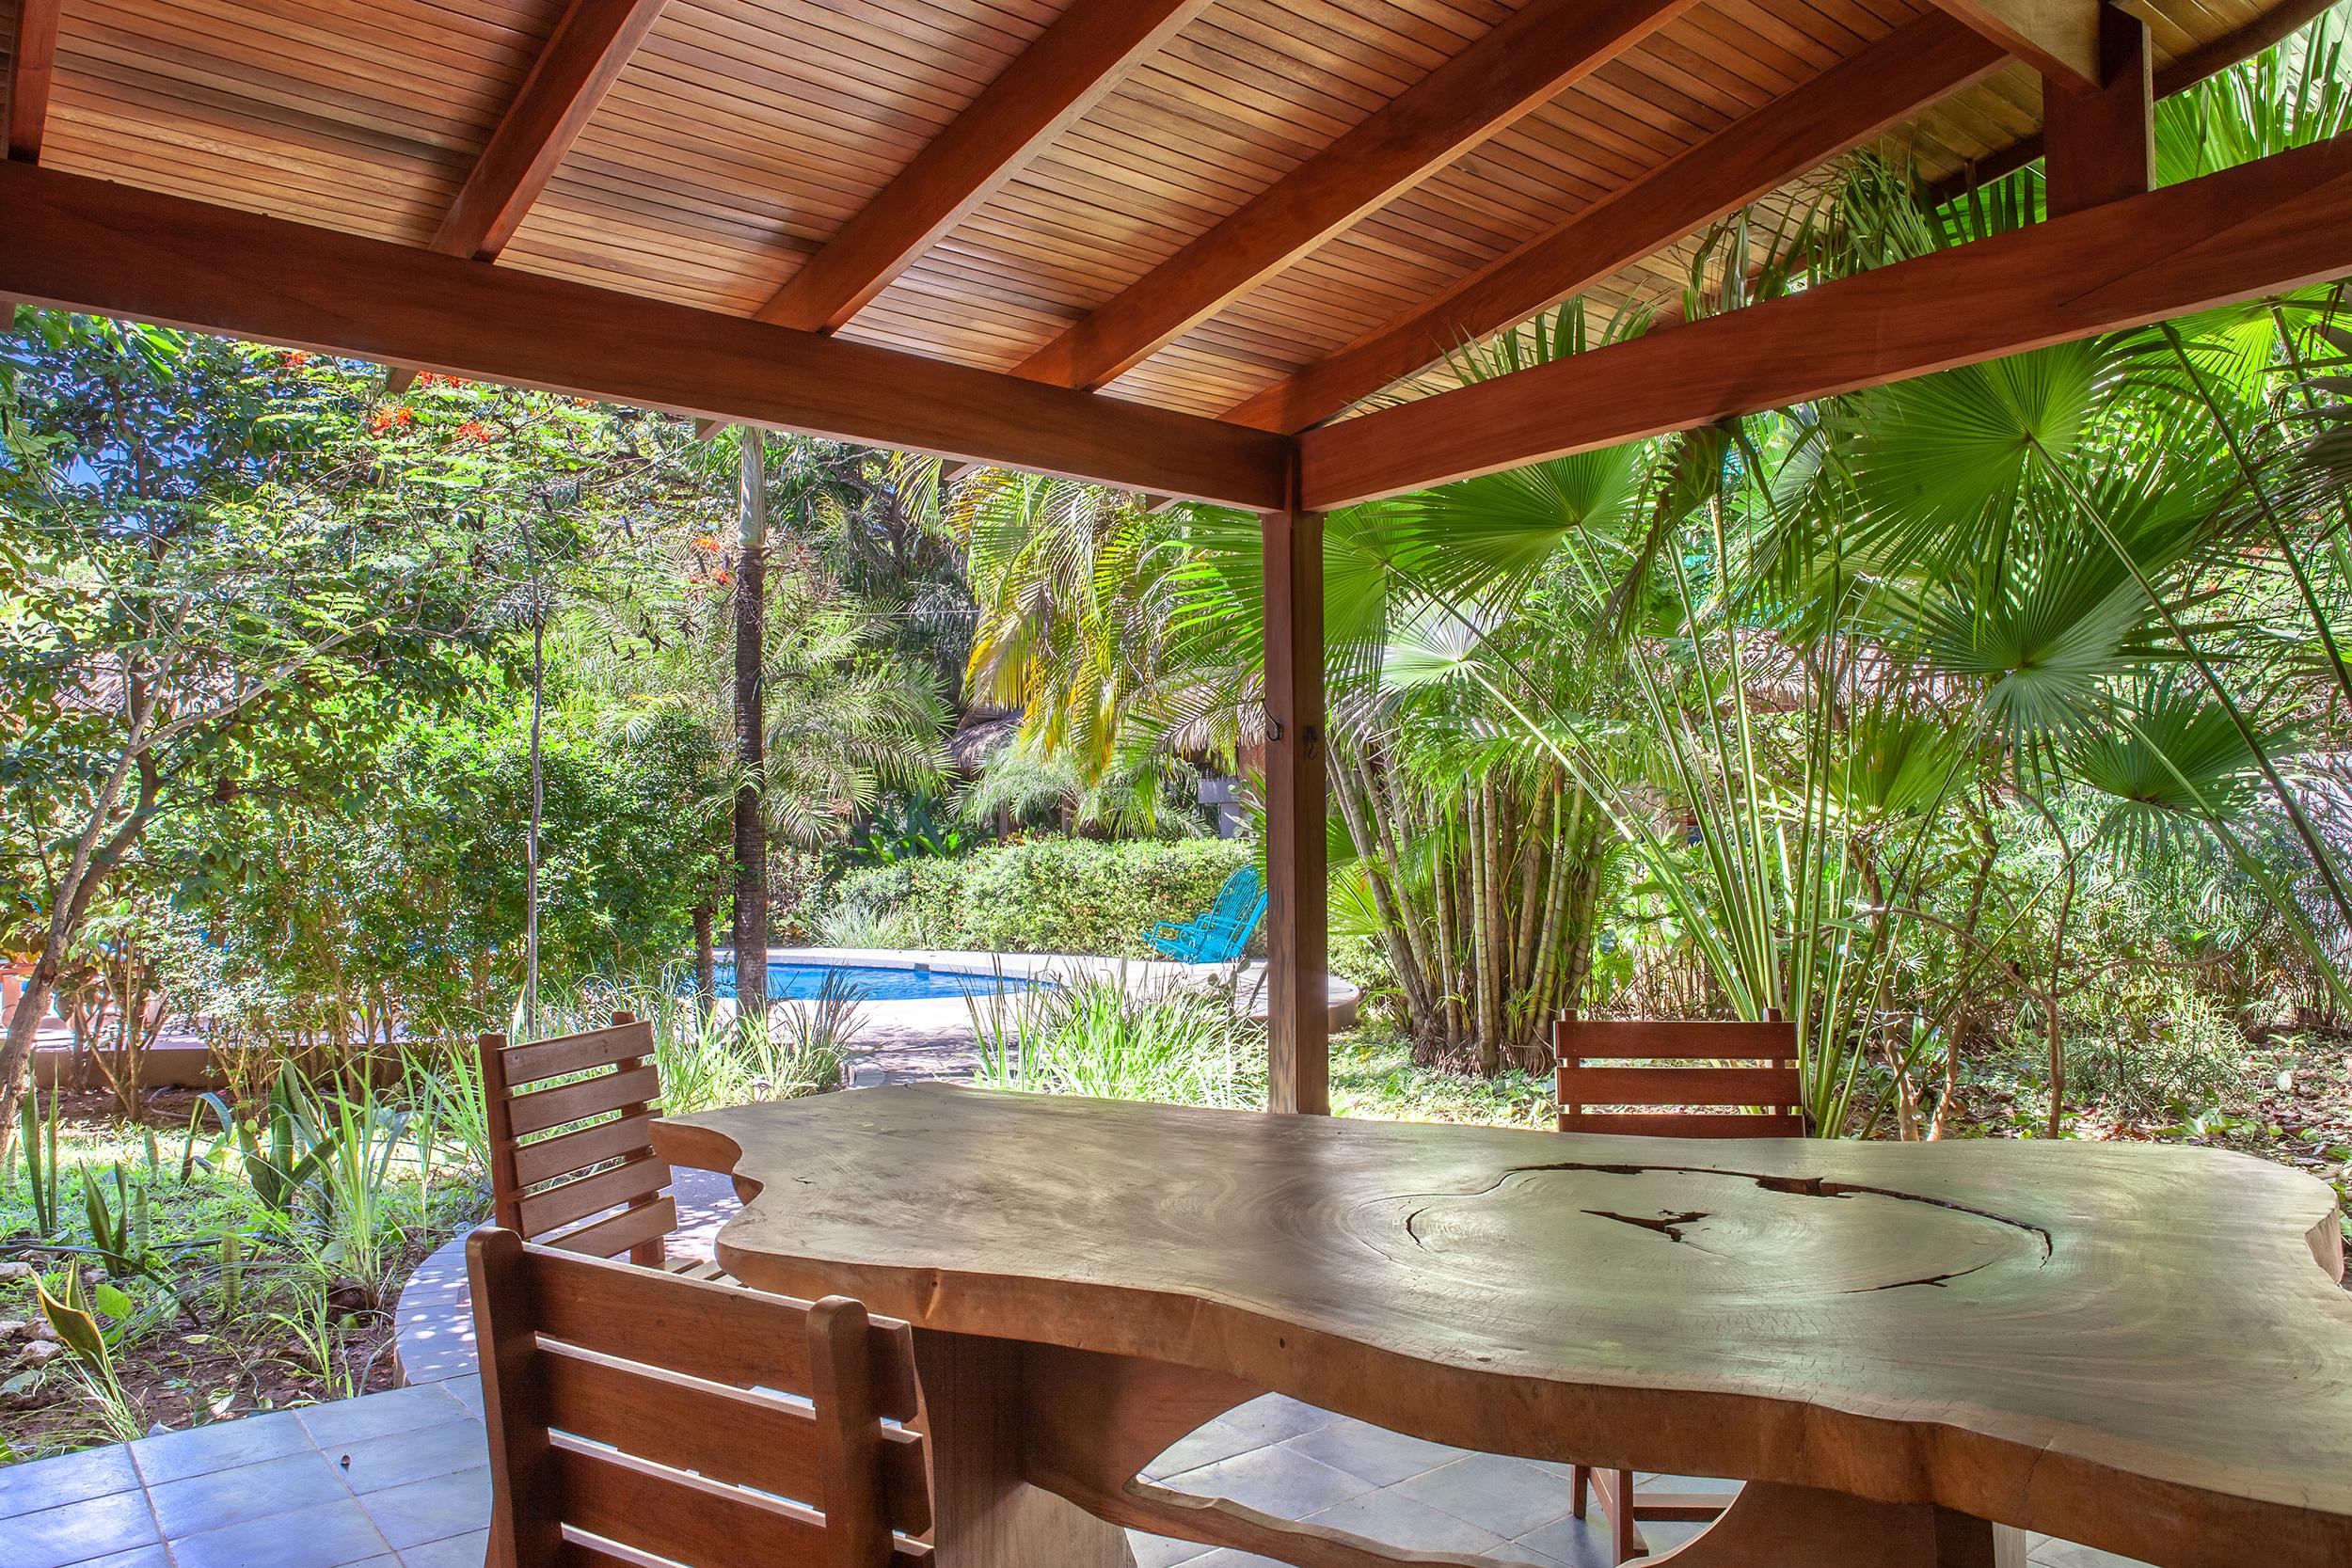 LOW - Casa las Brisas -  Jardines019.jpg